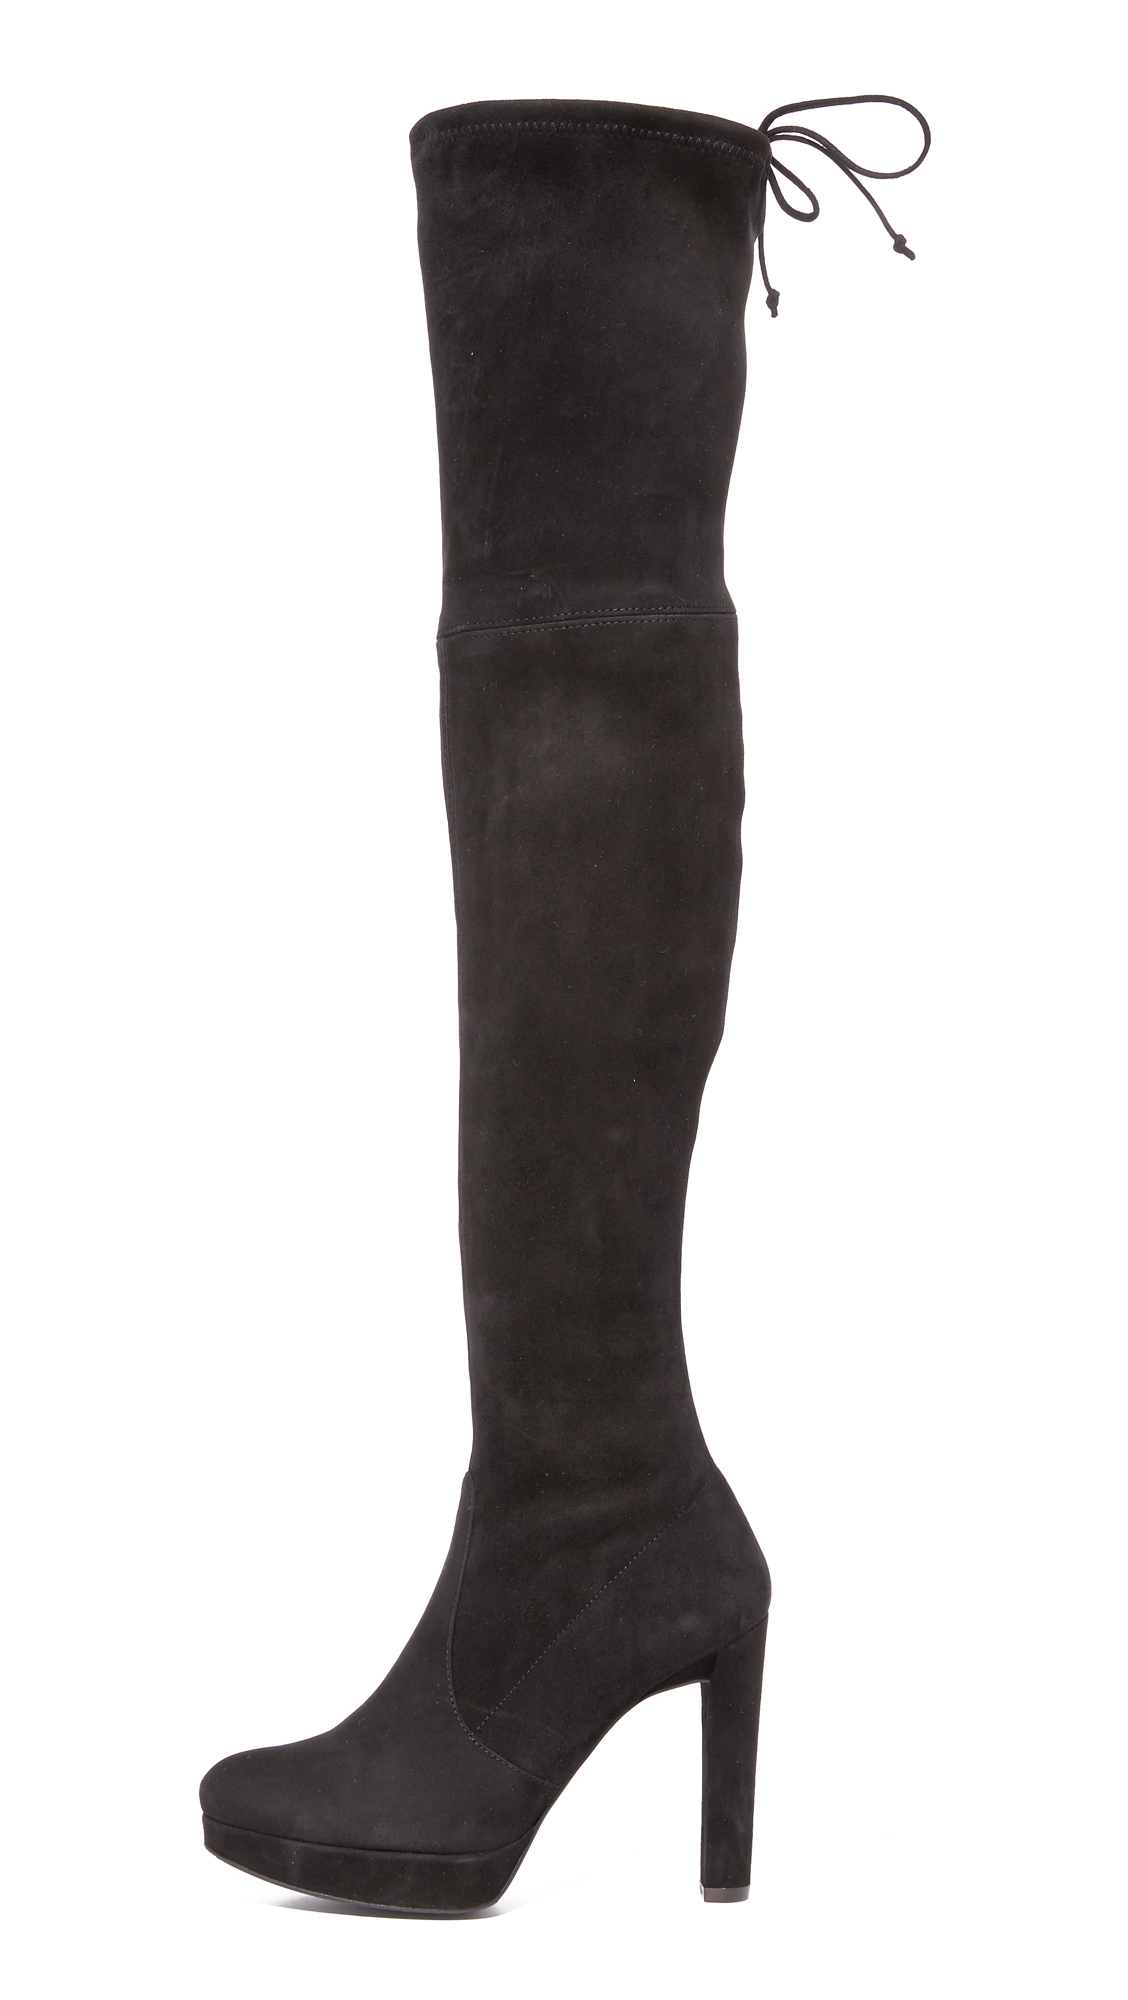 Stuart Weitzman Suede Platform Highland Over The Knee Boots in Black